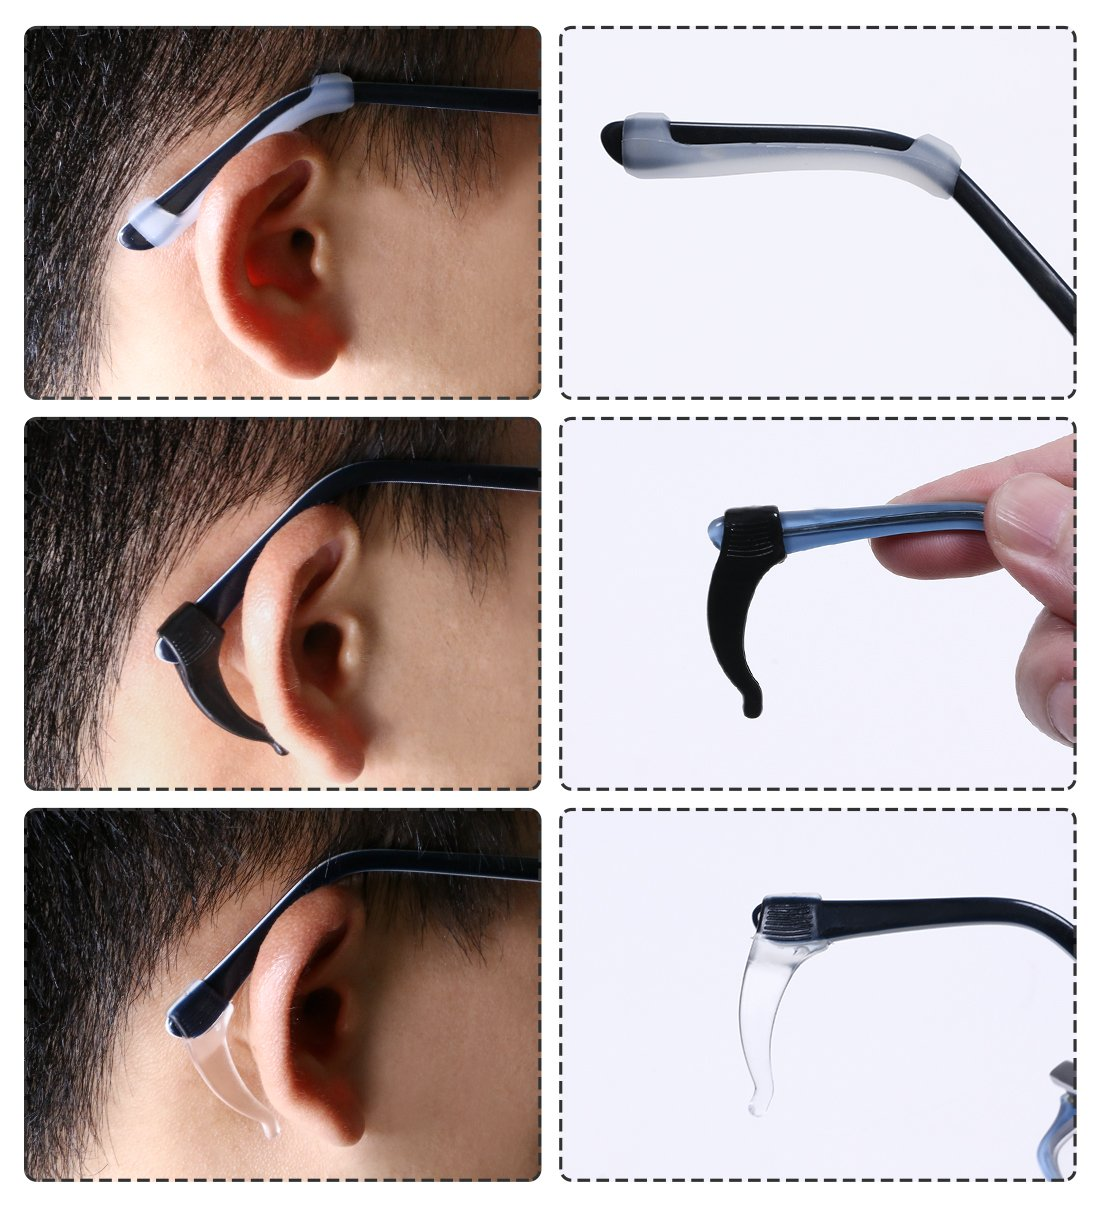 Penta Angel 8 Pairs Prevent Eyewear Slipping Silicone Eyeglass Strap Holder Anti Slide Glasses Sunglasses Spectacle Temple Tip Sports Ear Hook Grip Anti Slip Elastic Sleeve Retainer for Kids Adults